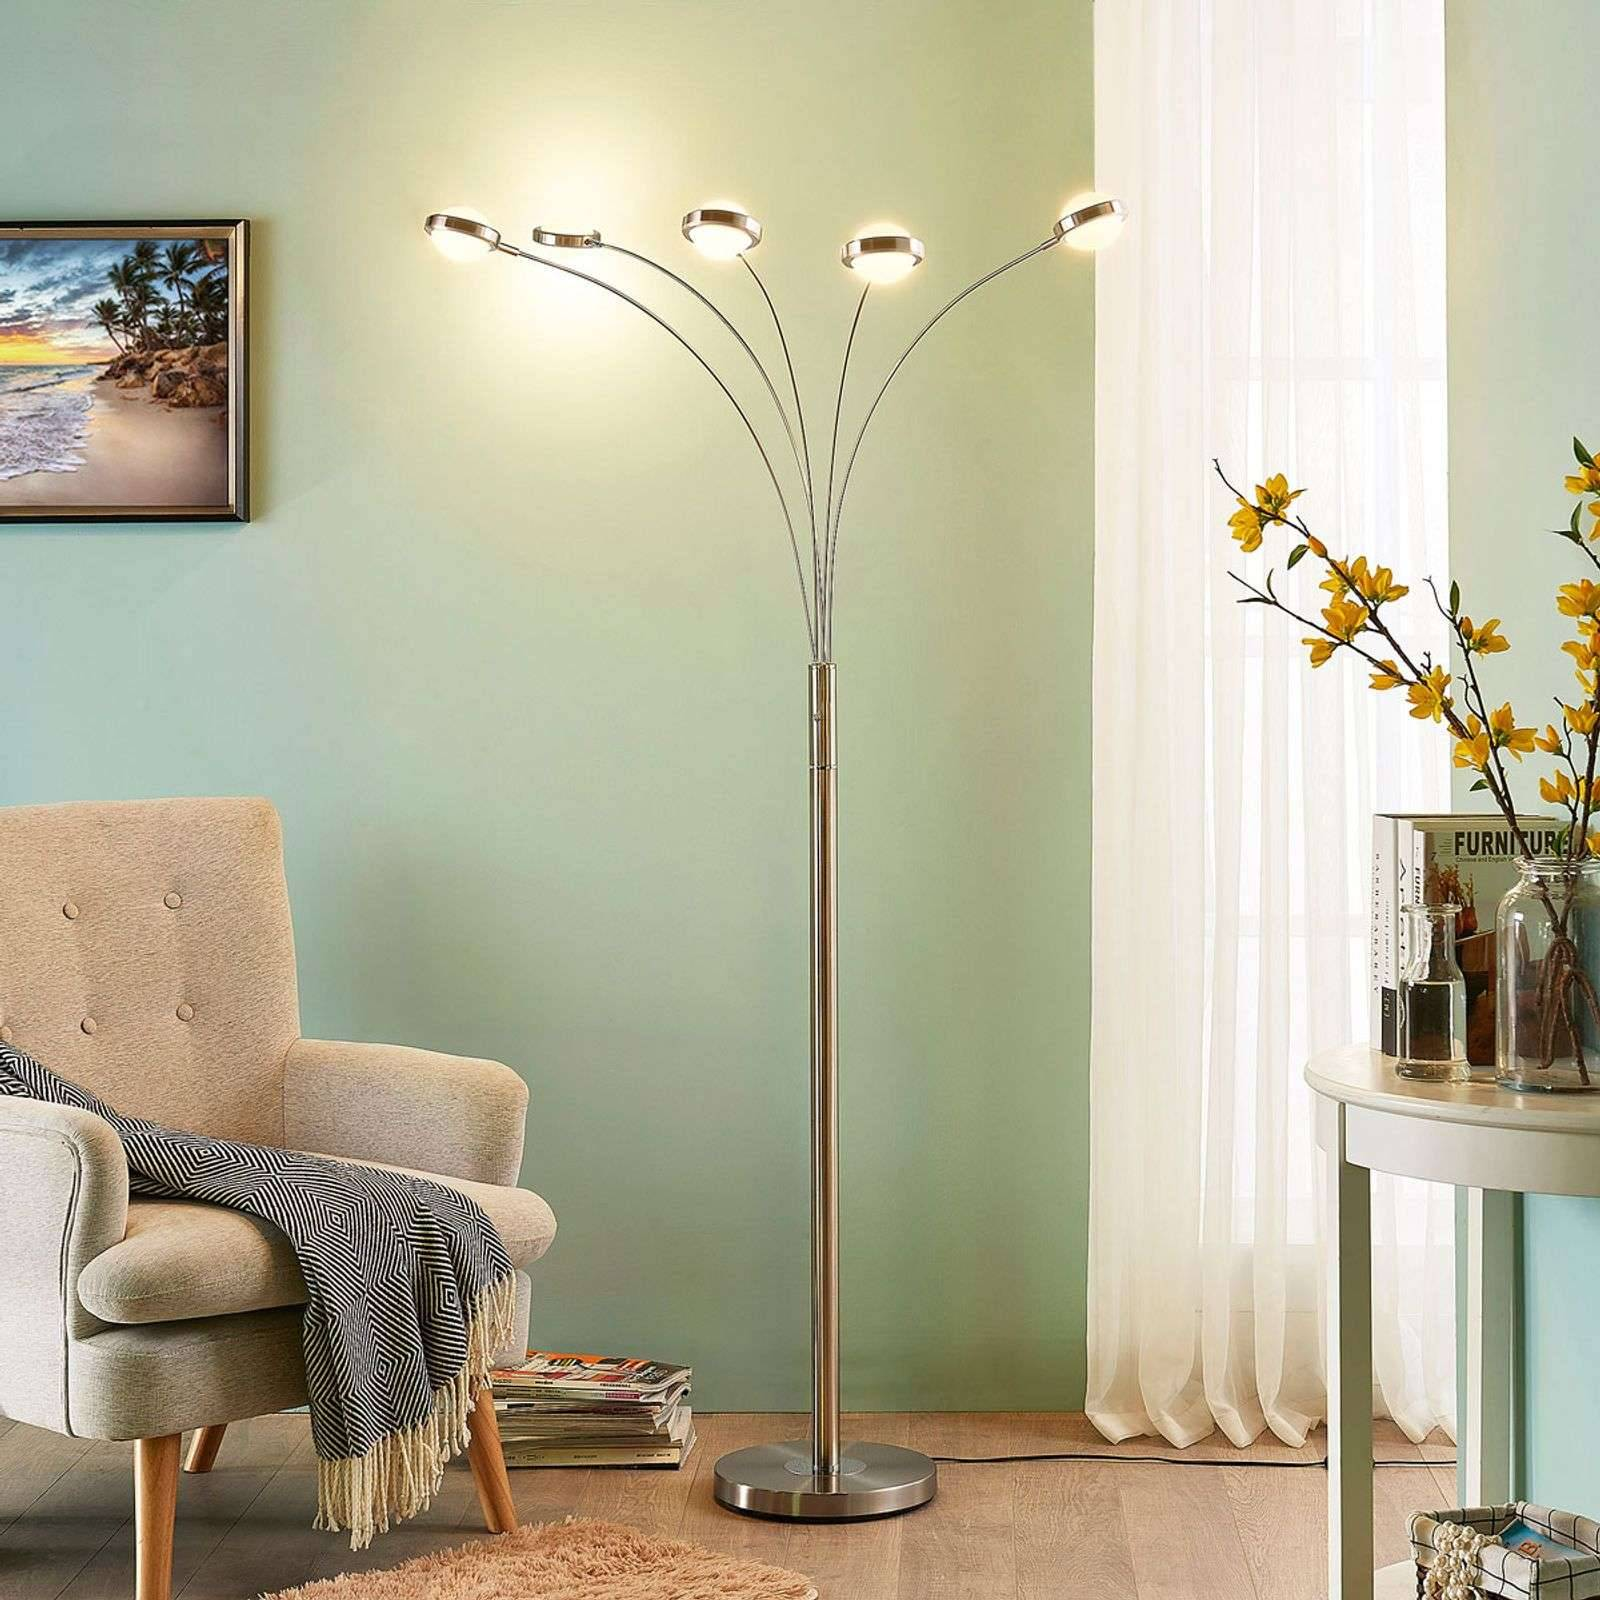 Lampenwelt.com Lampadaire LED à 5 lampes Catriona avec variateur - LAMPENWELT.com